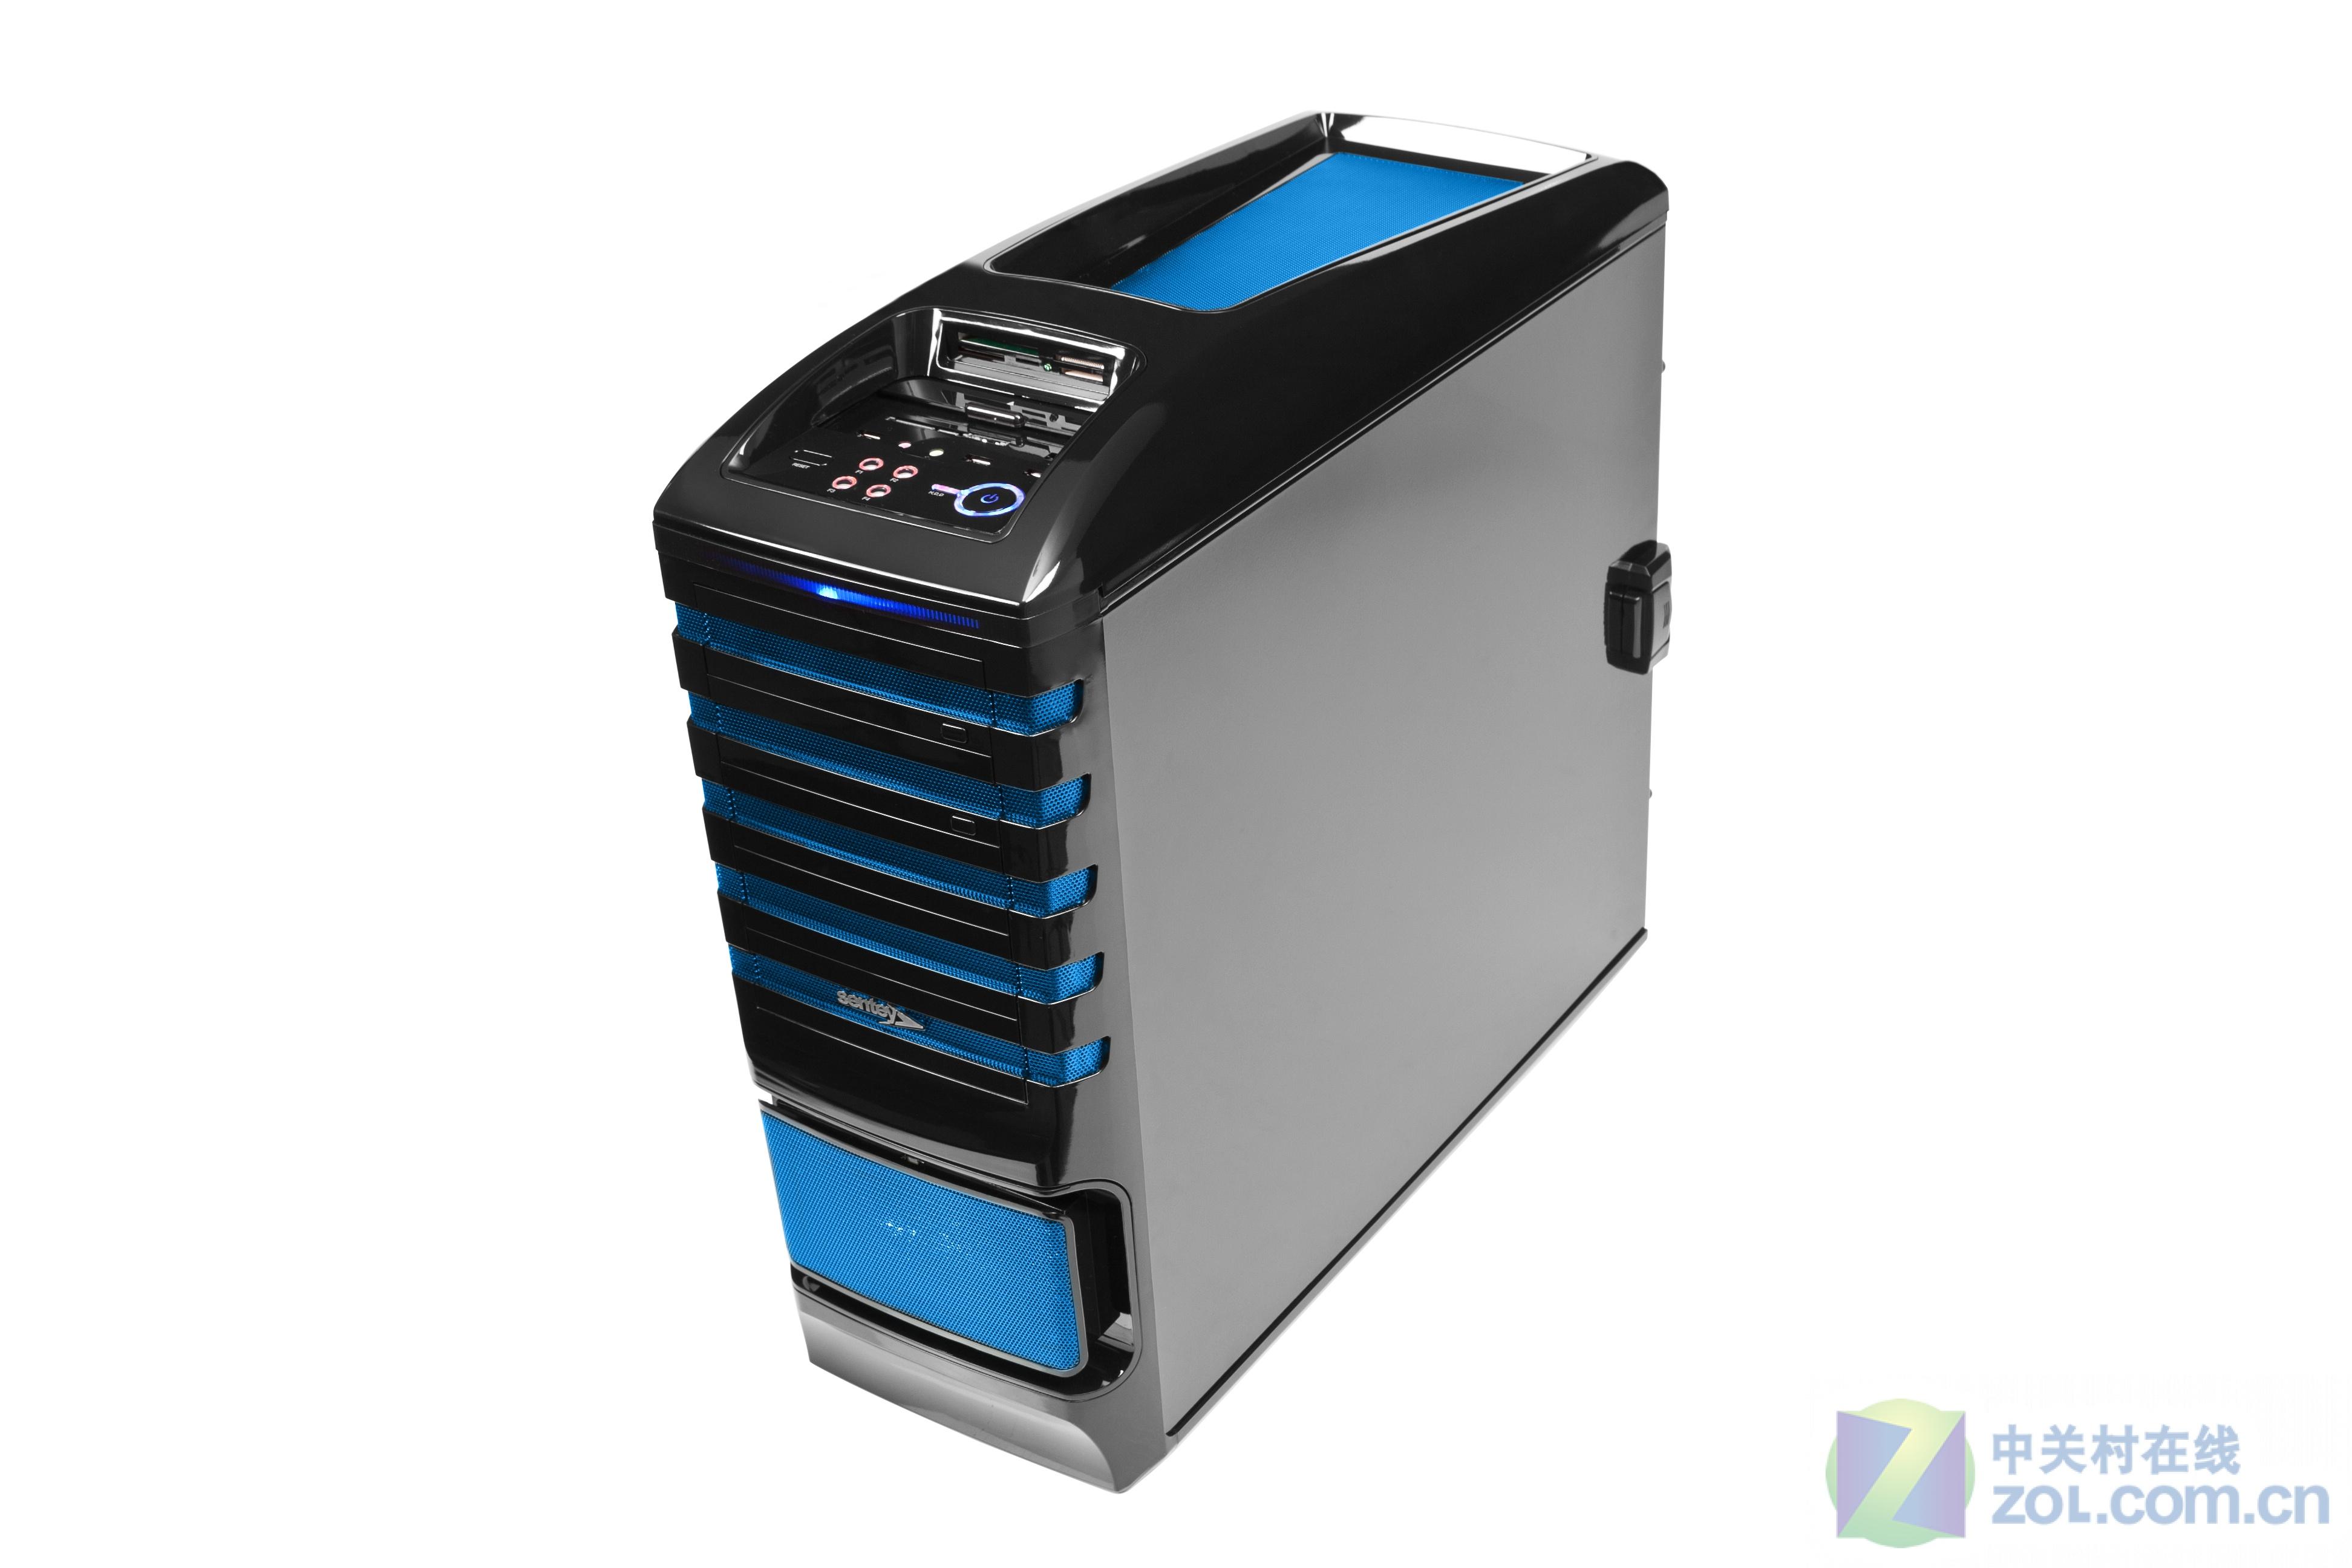 Sentey是一家在欧洲市场经营多年的机电品牌,旗下产品普遍拥有较为绚丽的外观和完善的功能性。此次笔者给大家找来了Sentey品牌下全塔式机箱GS-6500系列的图片,希望大家能够喜欢。该机箱拥有7个PCI槽,散热系统十分完善,可以安装EATX级别的主板,带有4个光驱位和1个软驱位,上部拥有非常完善的外置硬盘、读卡器、调速器等功能,板材厚度也达到了1mm,可以说拥有大量高端产品才具备的元素。由于该品牌产品全部采用代工,所以我们也许在不久的将来就会看到非常类似的产品,就让我们一起期待吧。 作者:商皛 201